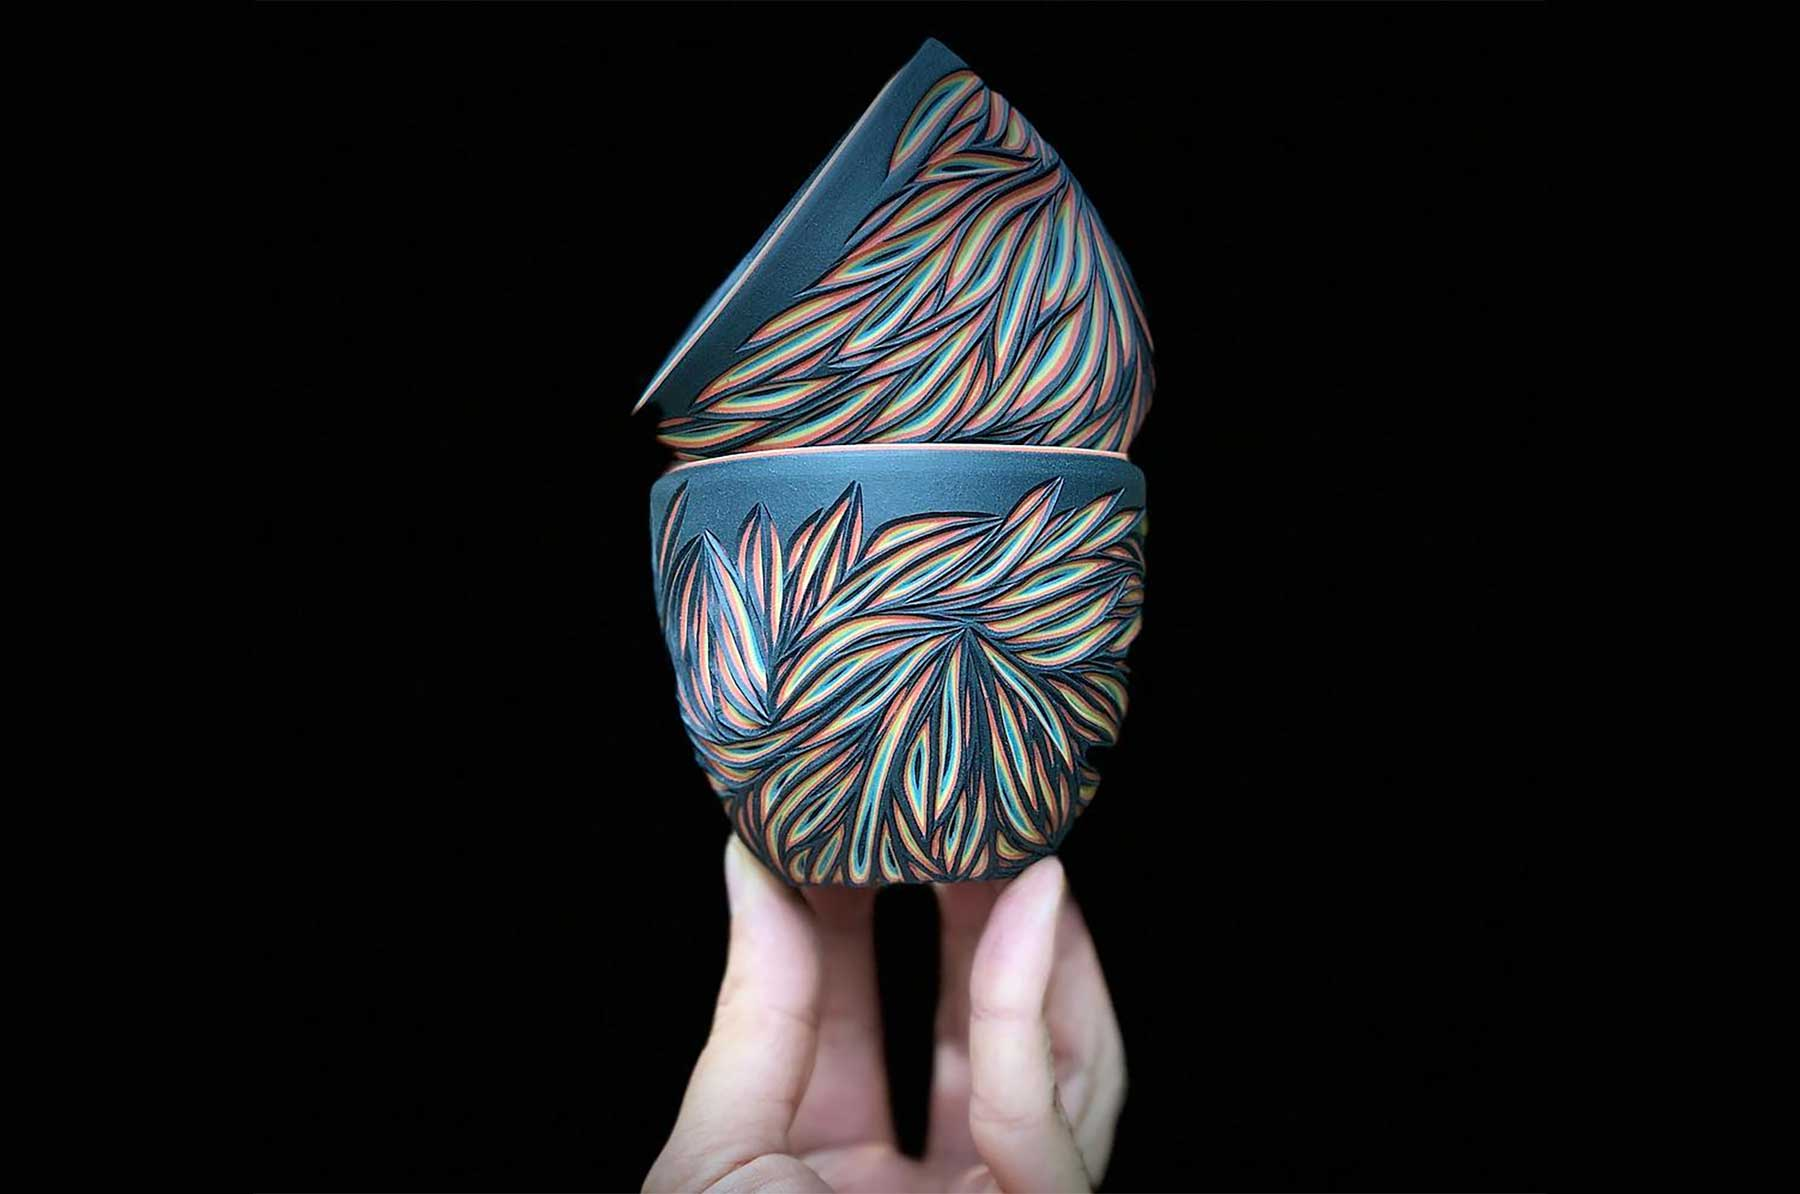 Vielschichtige Vasen-Schnitzer